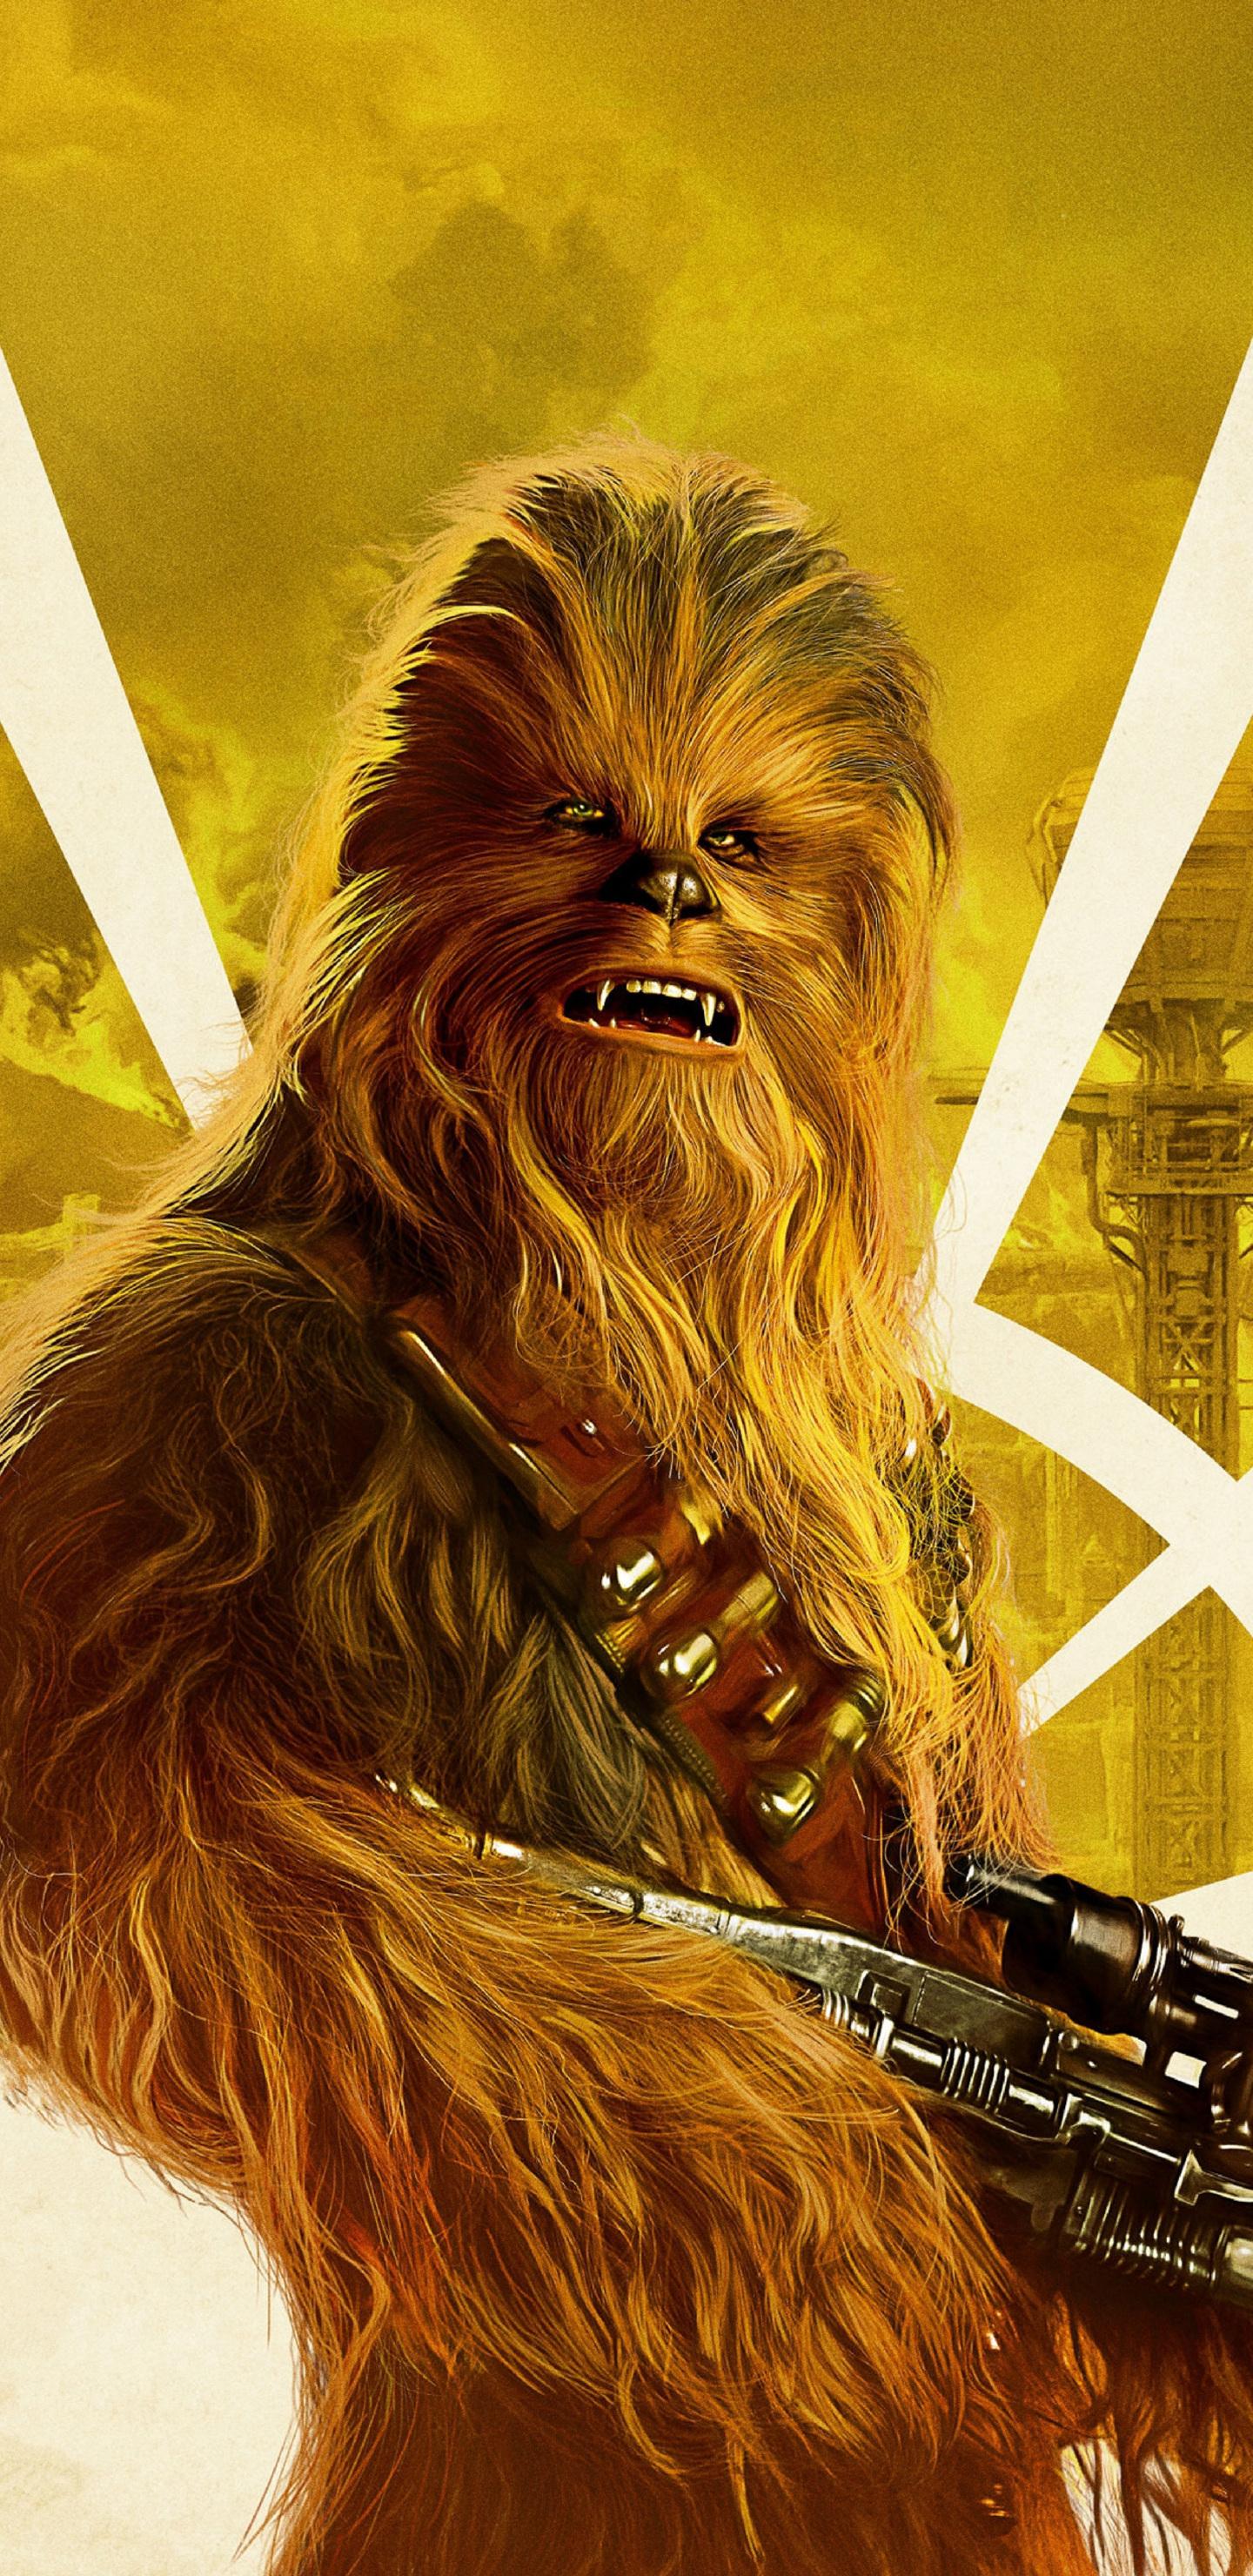 chewbacca-in-solo-a-star-wars-story-movie-lq.jpg